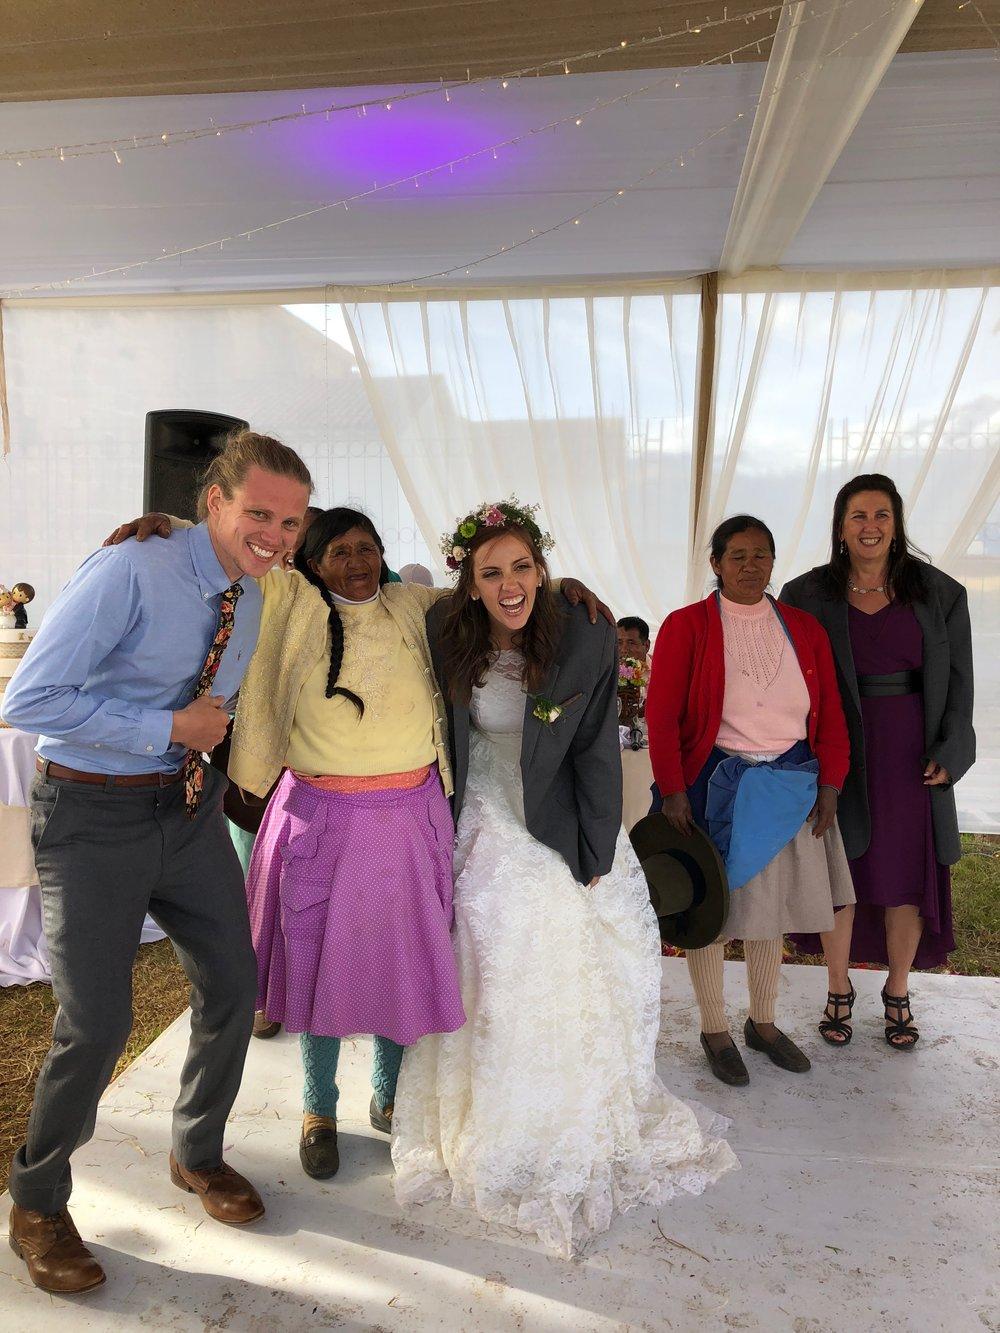 ramble and rove - wedding blog - lifestyle blog - peru wedding - peru mountains - extreme wedding - wedding